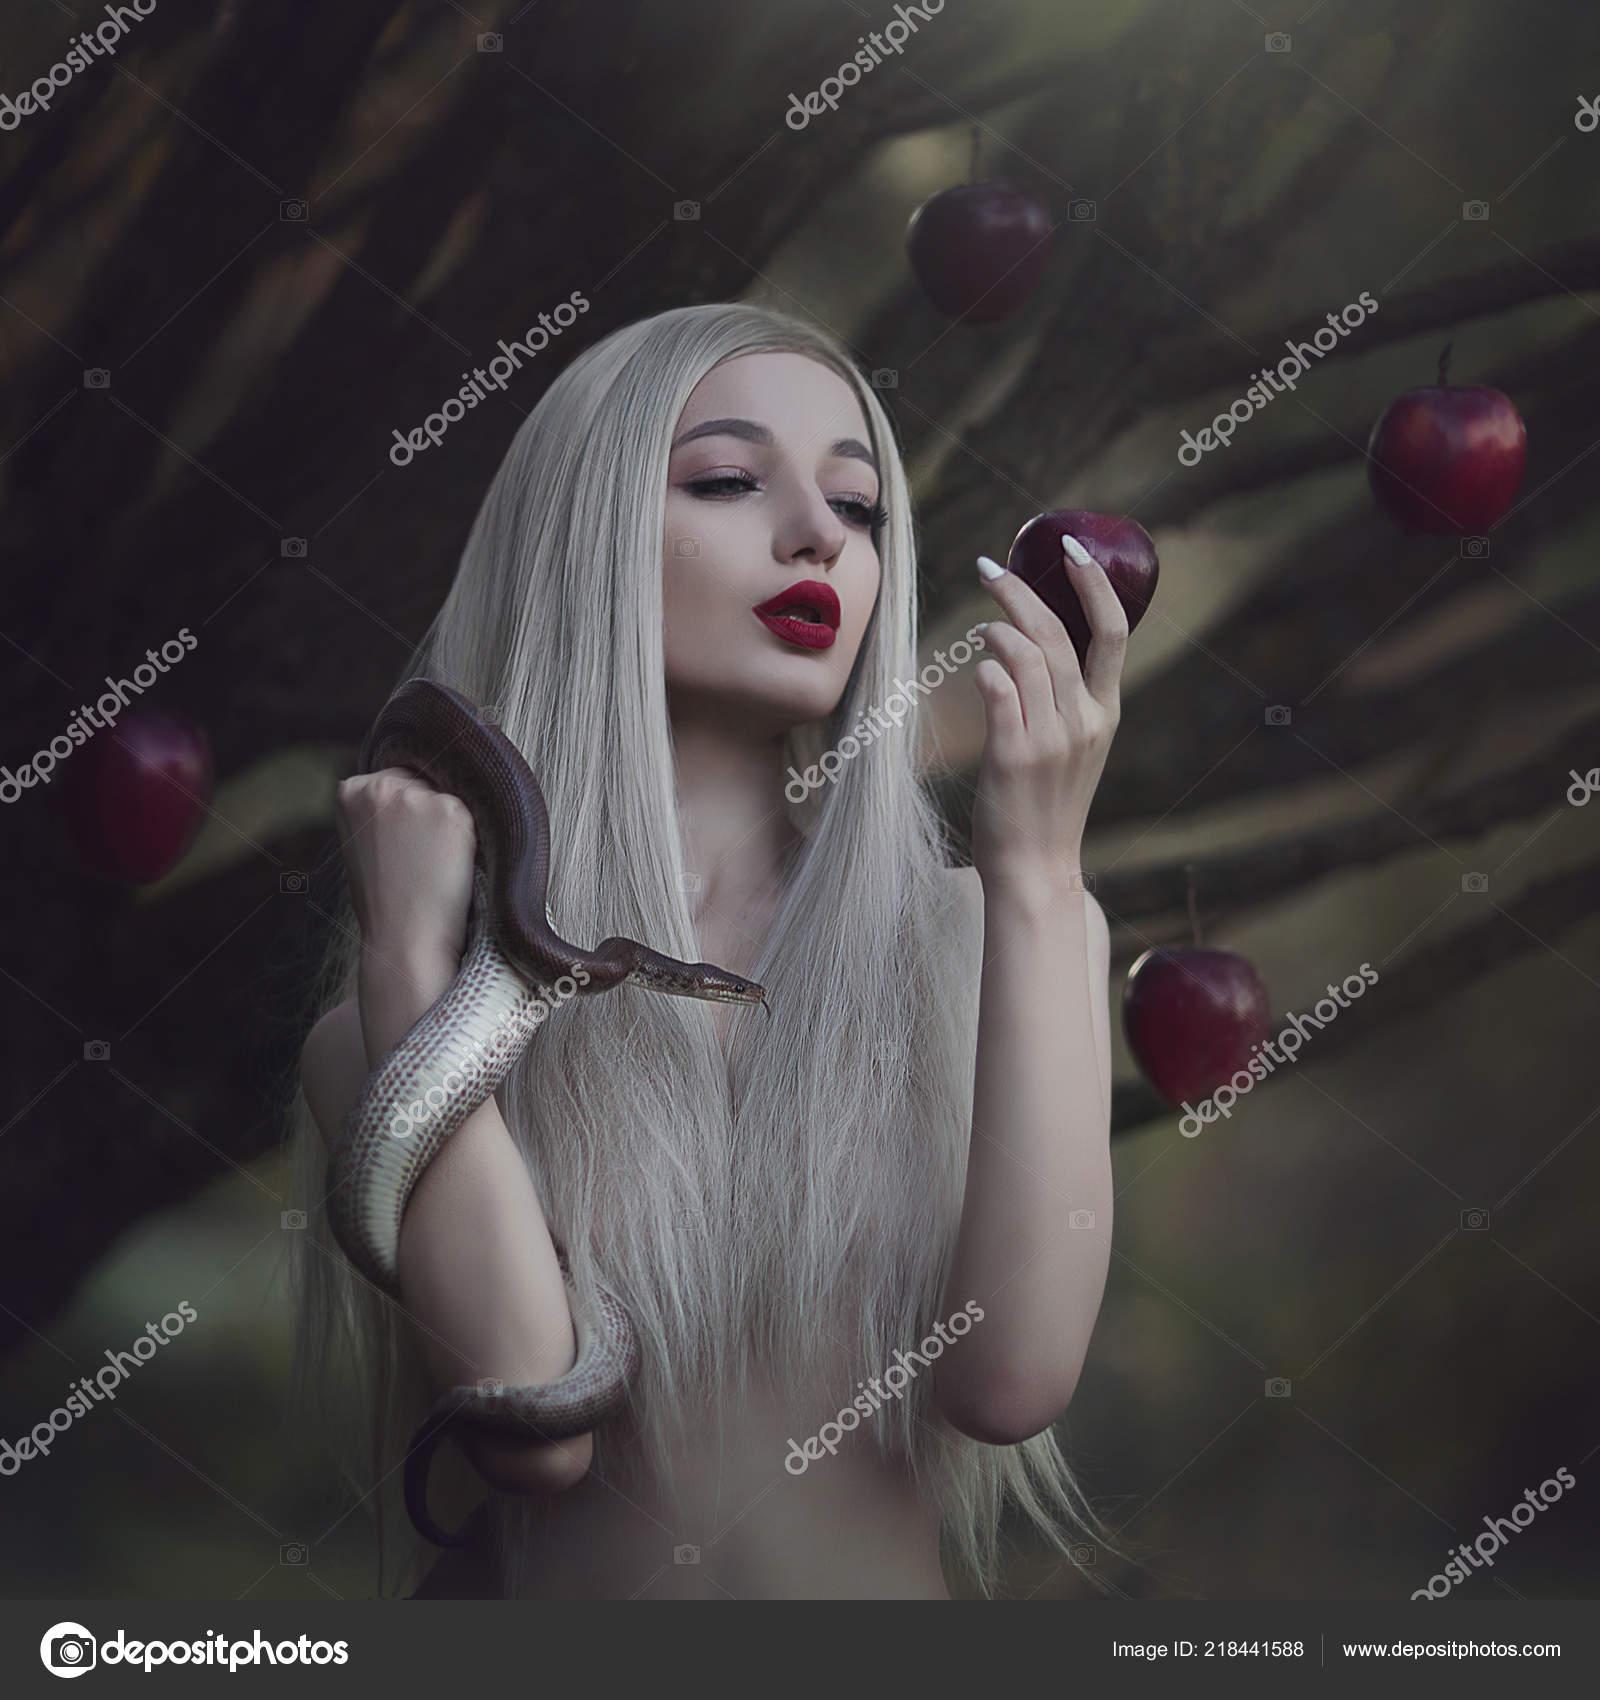 Eve Nude eve serpent tempter apple sin young beautiful nude girl very